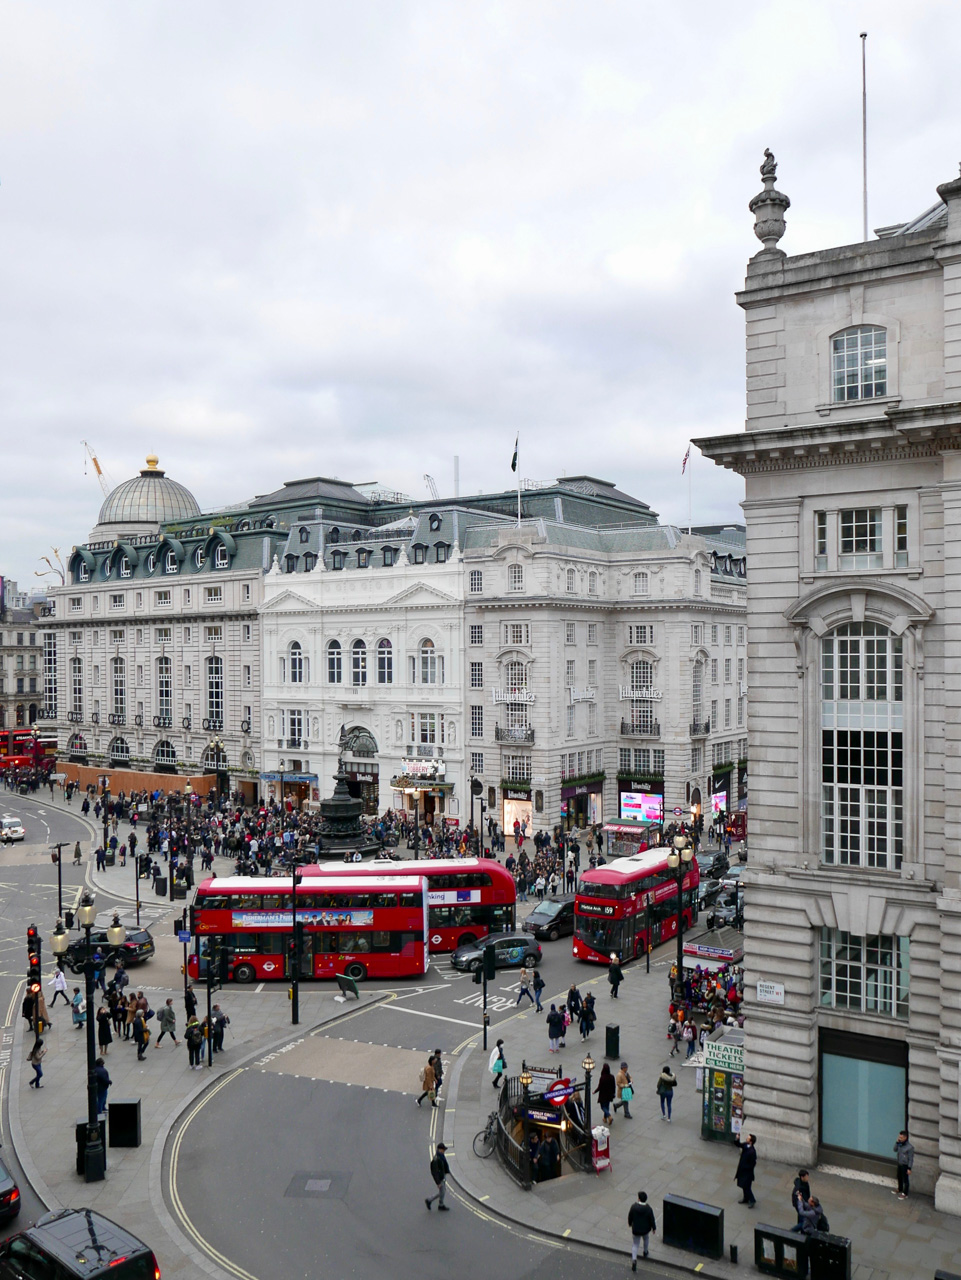 Cara Sharratt Travel - View from Hotel Café Royal - London, England